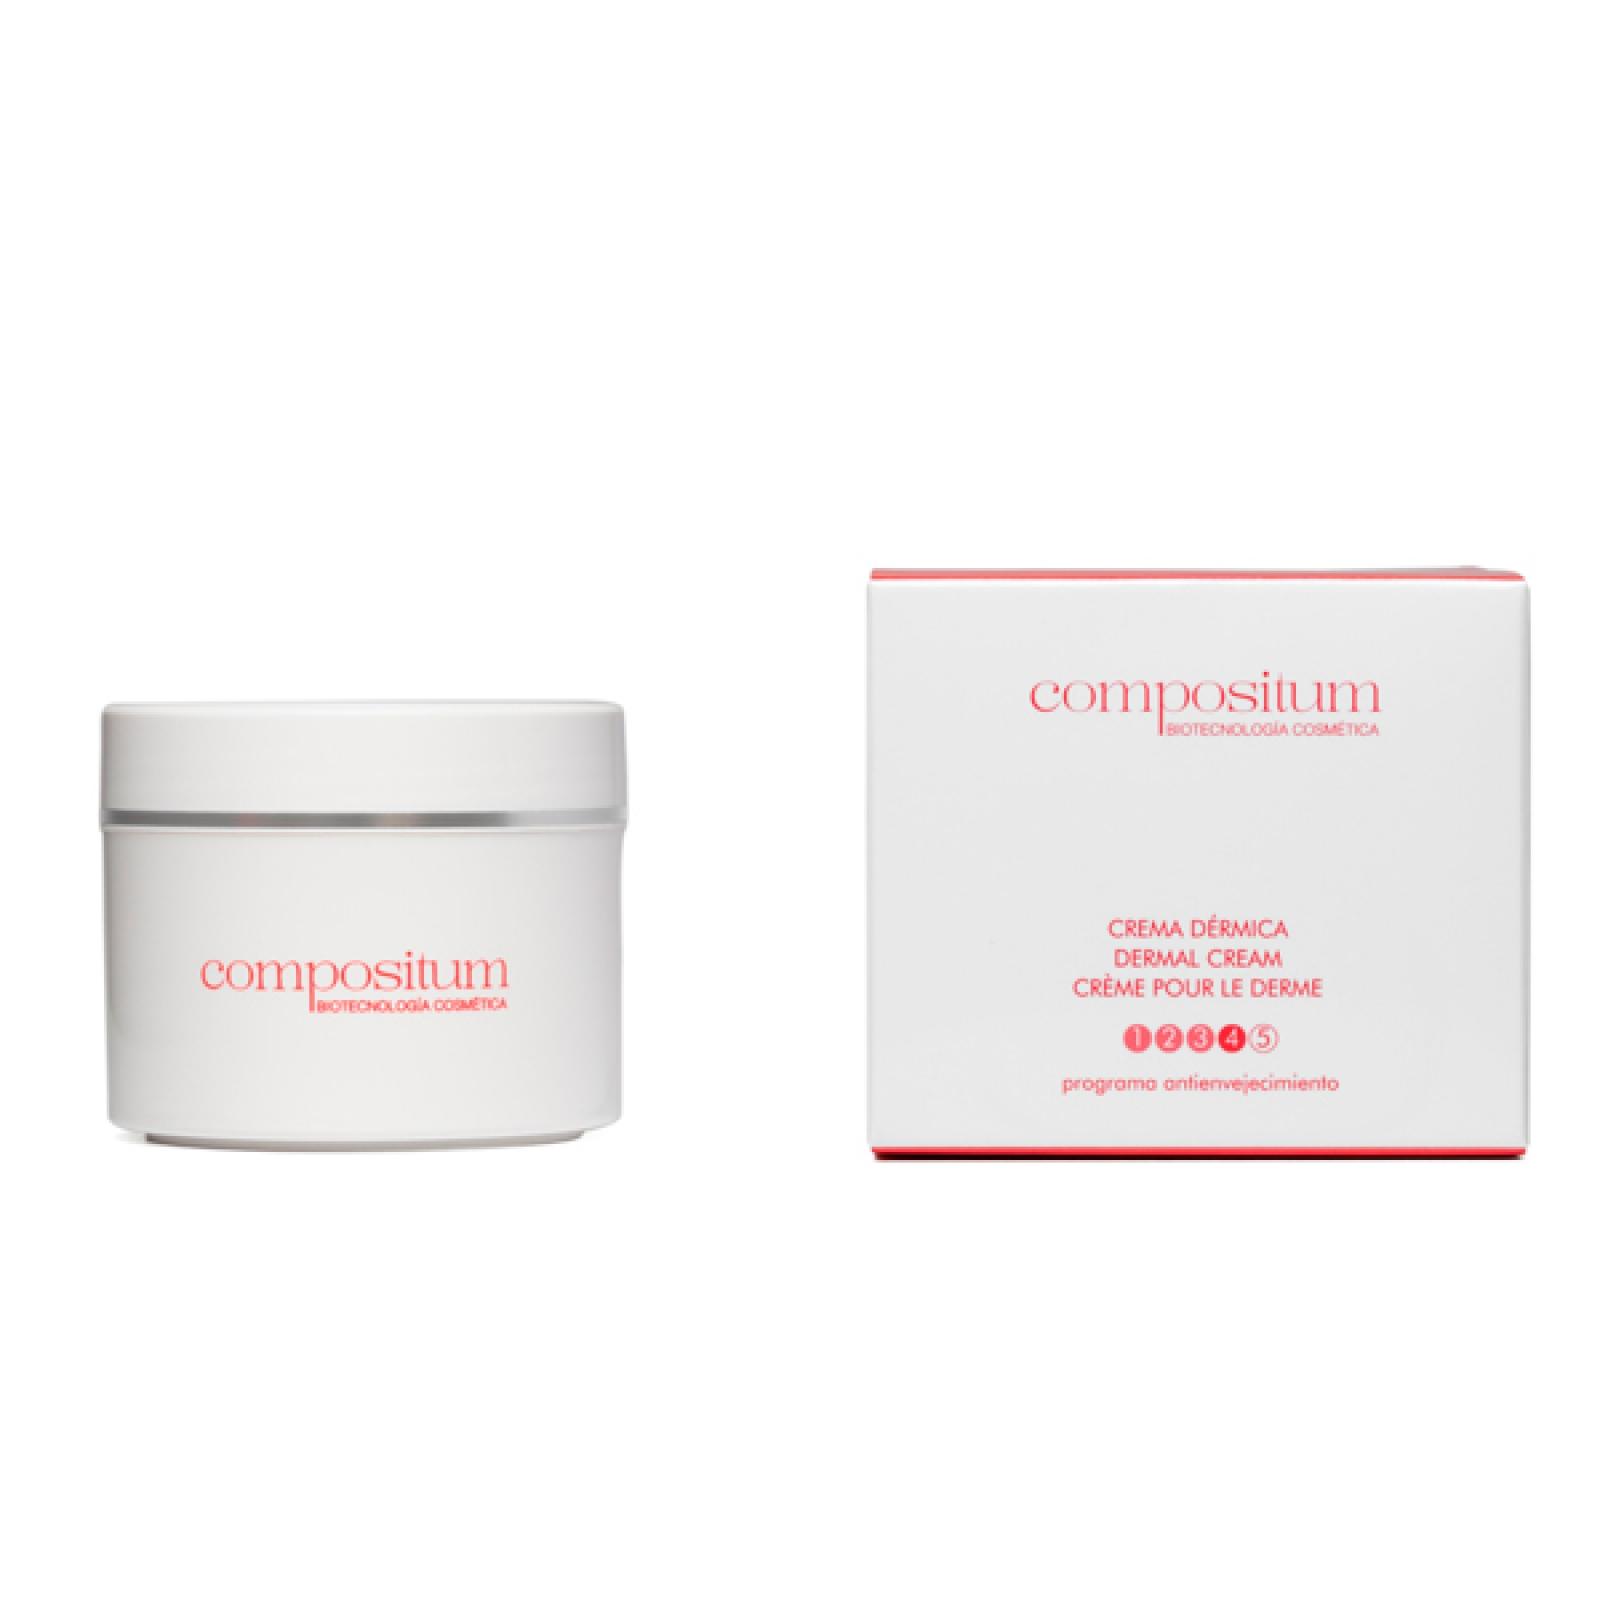 Dermal cream